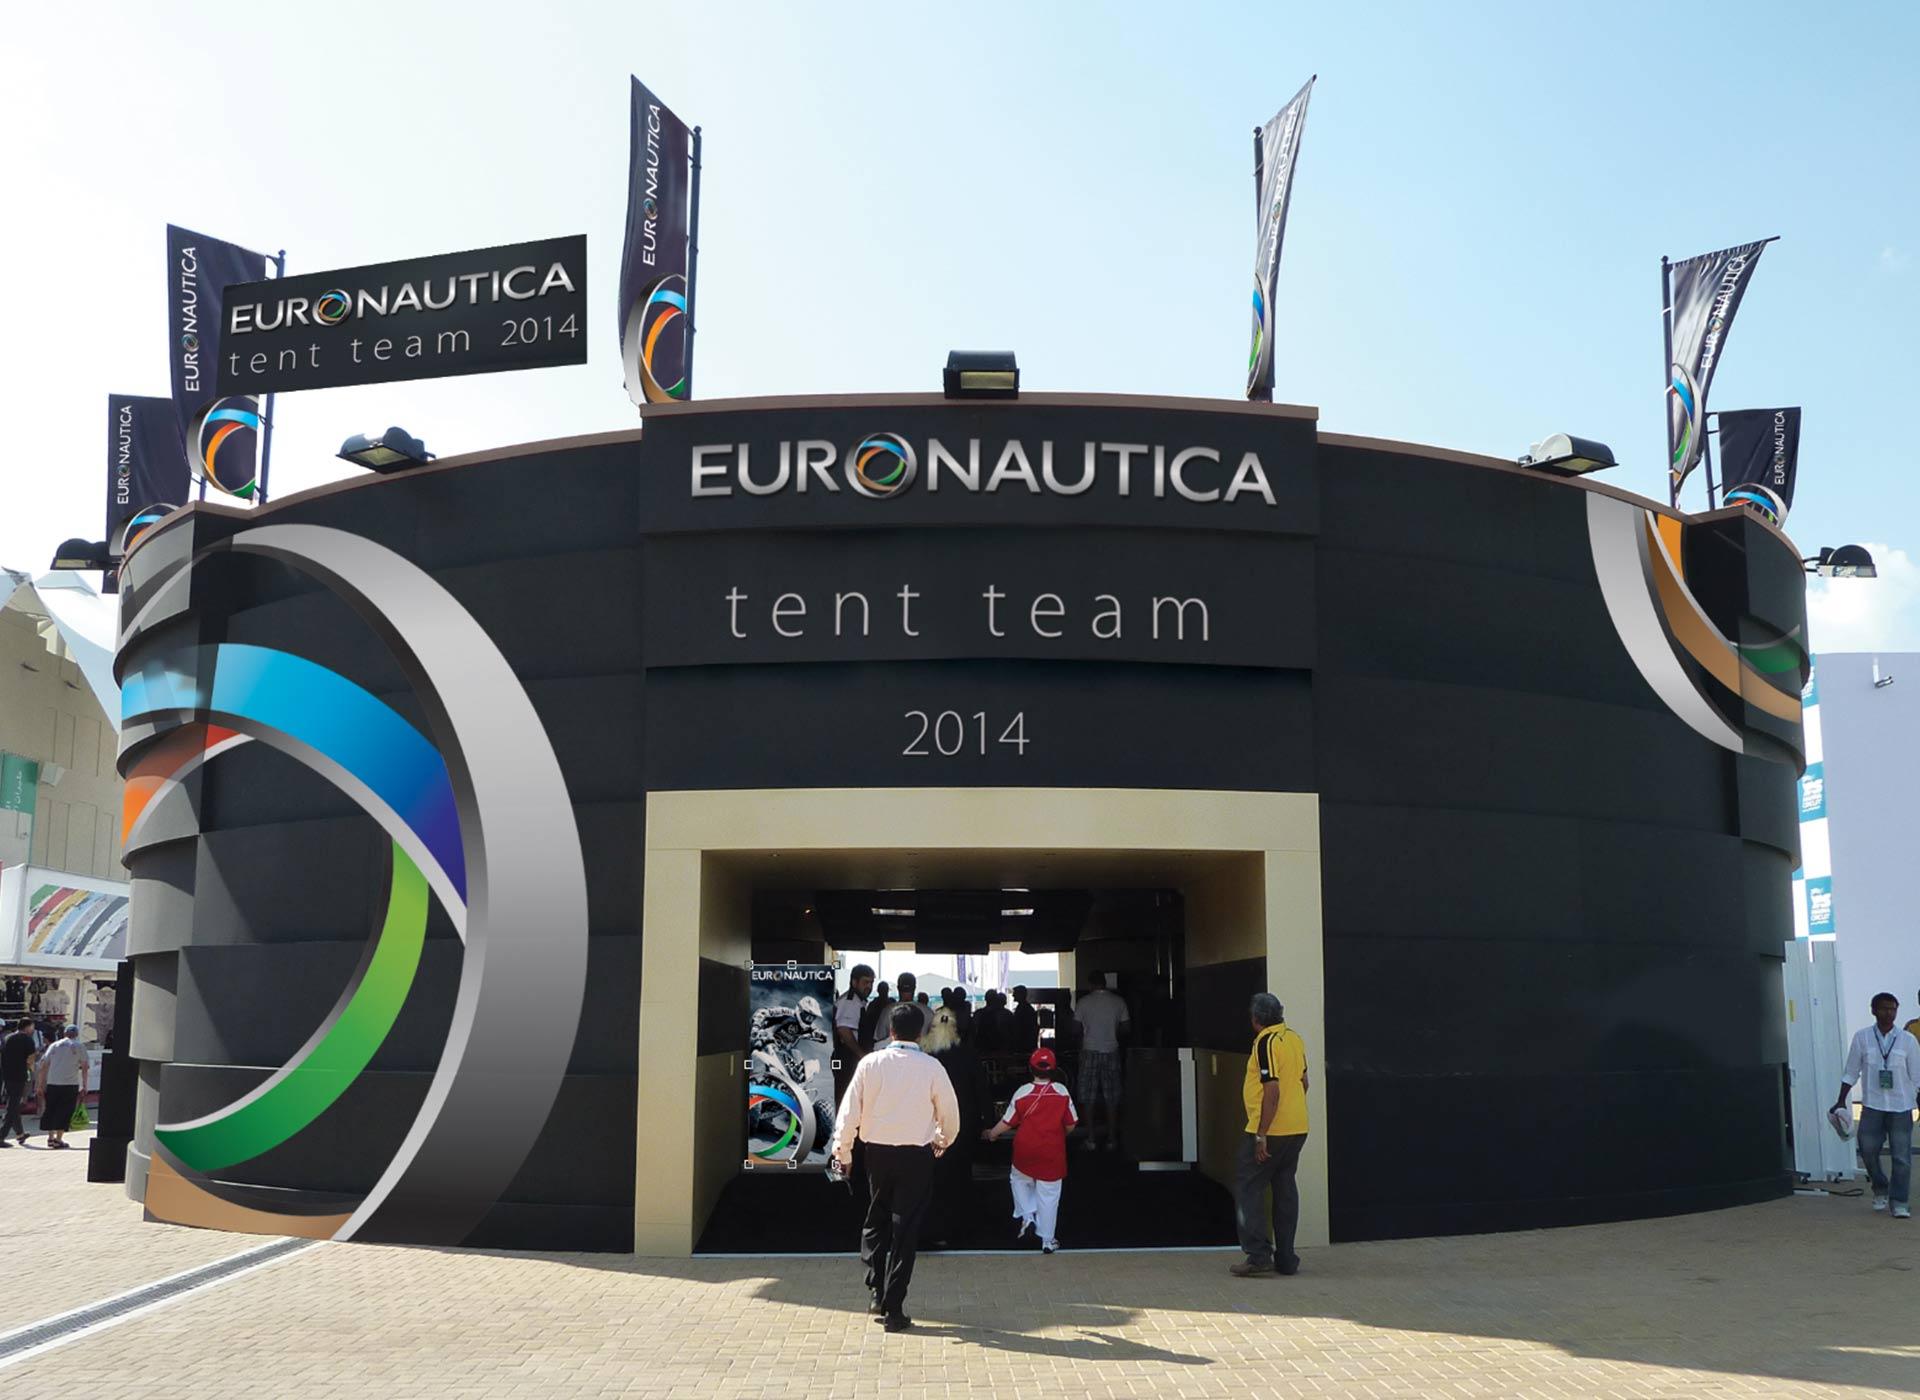 euronautica tent